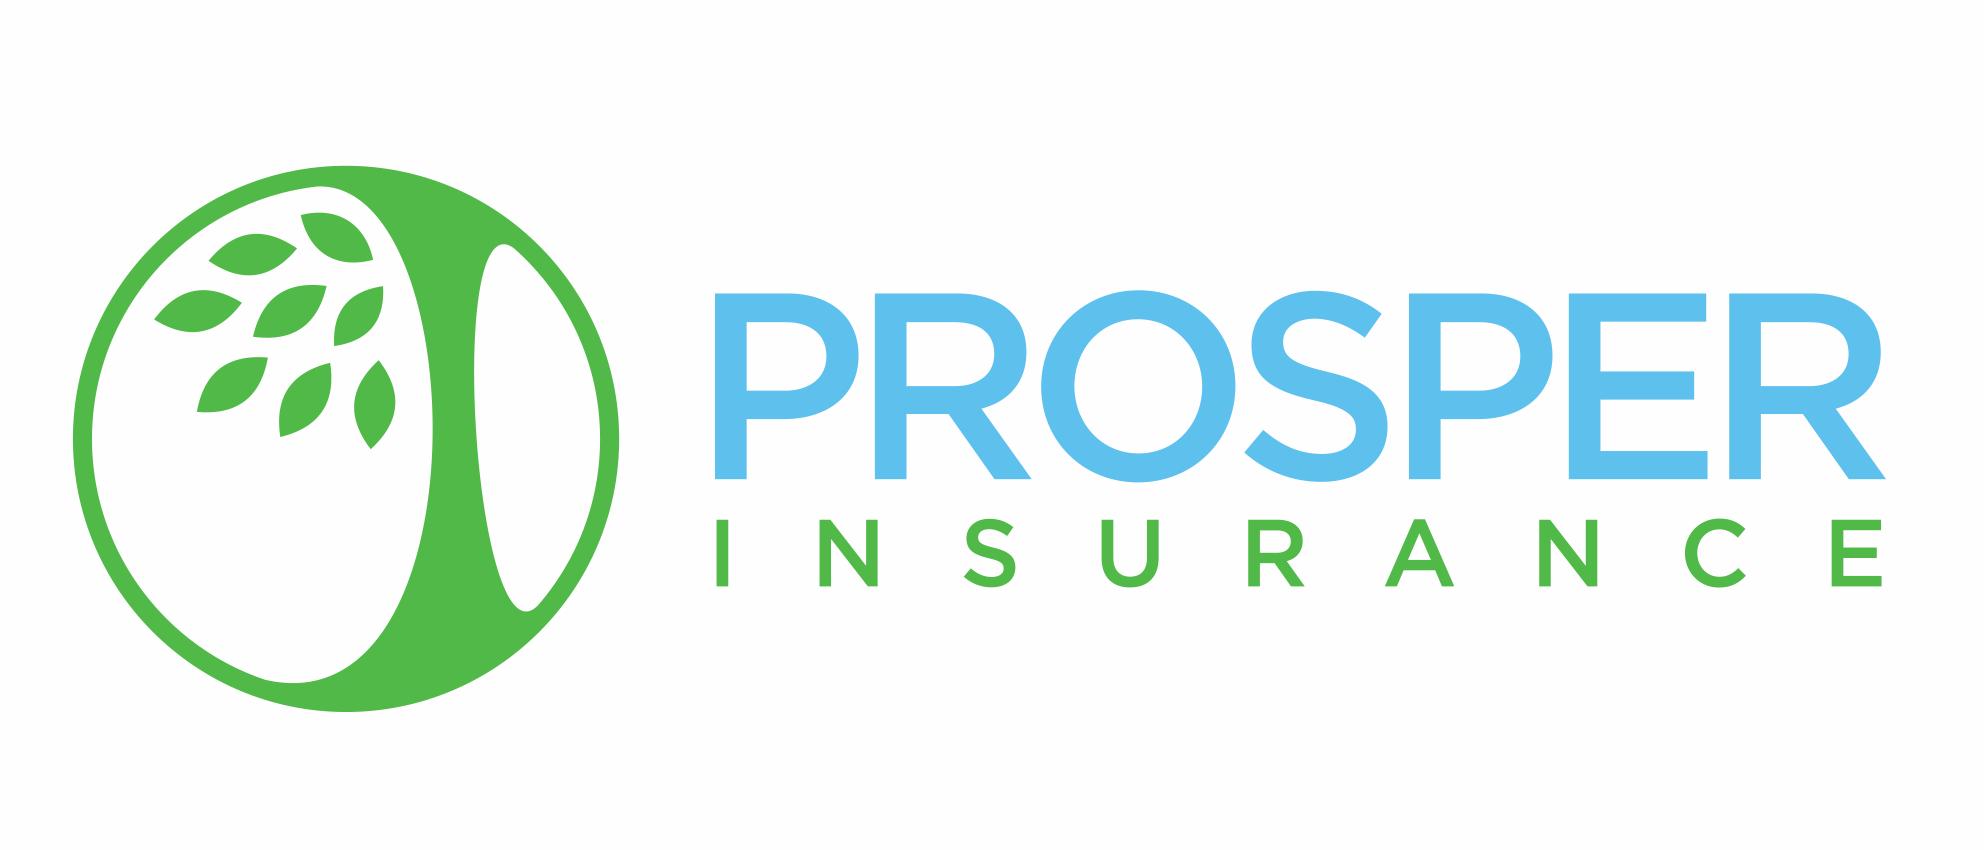 Chris Solorzano - Prosper Insurance